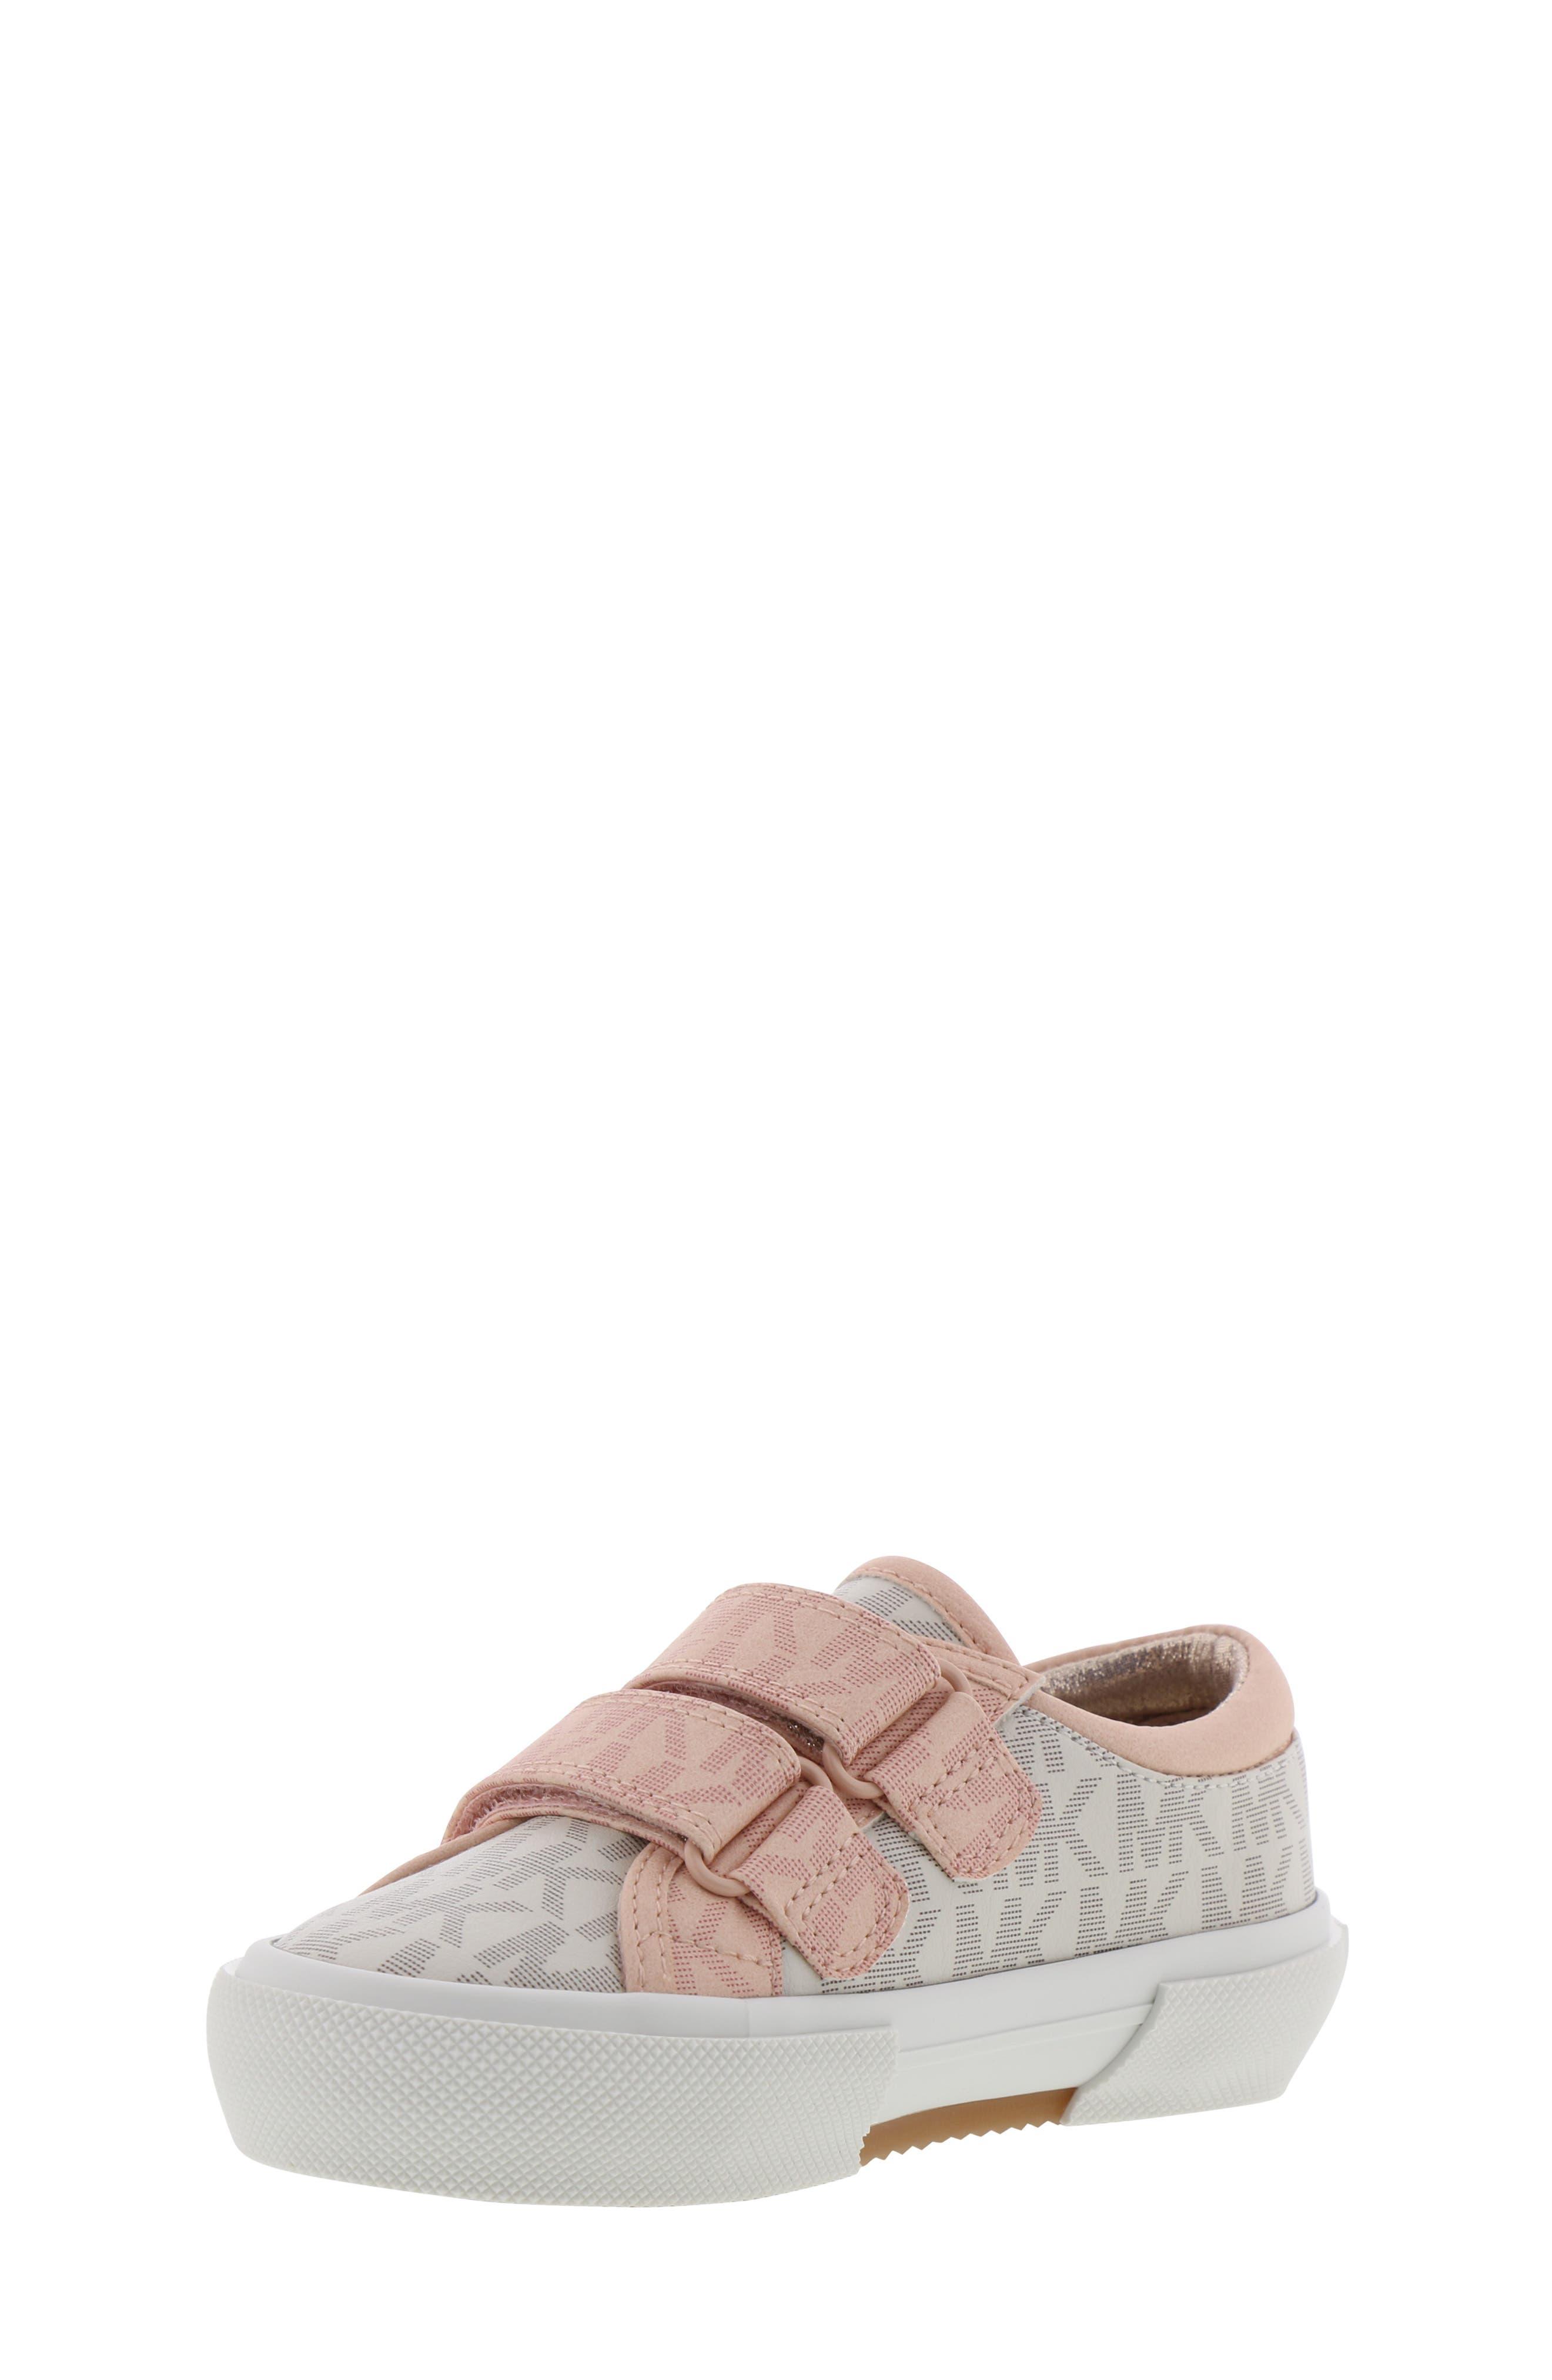 Ima Double Platform Sneaker,                             Alternate thumbnail 9, color,                             VANILLA/ BLUSH